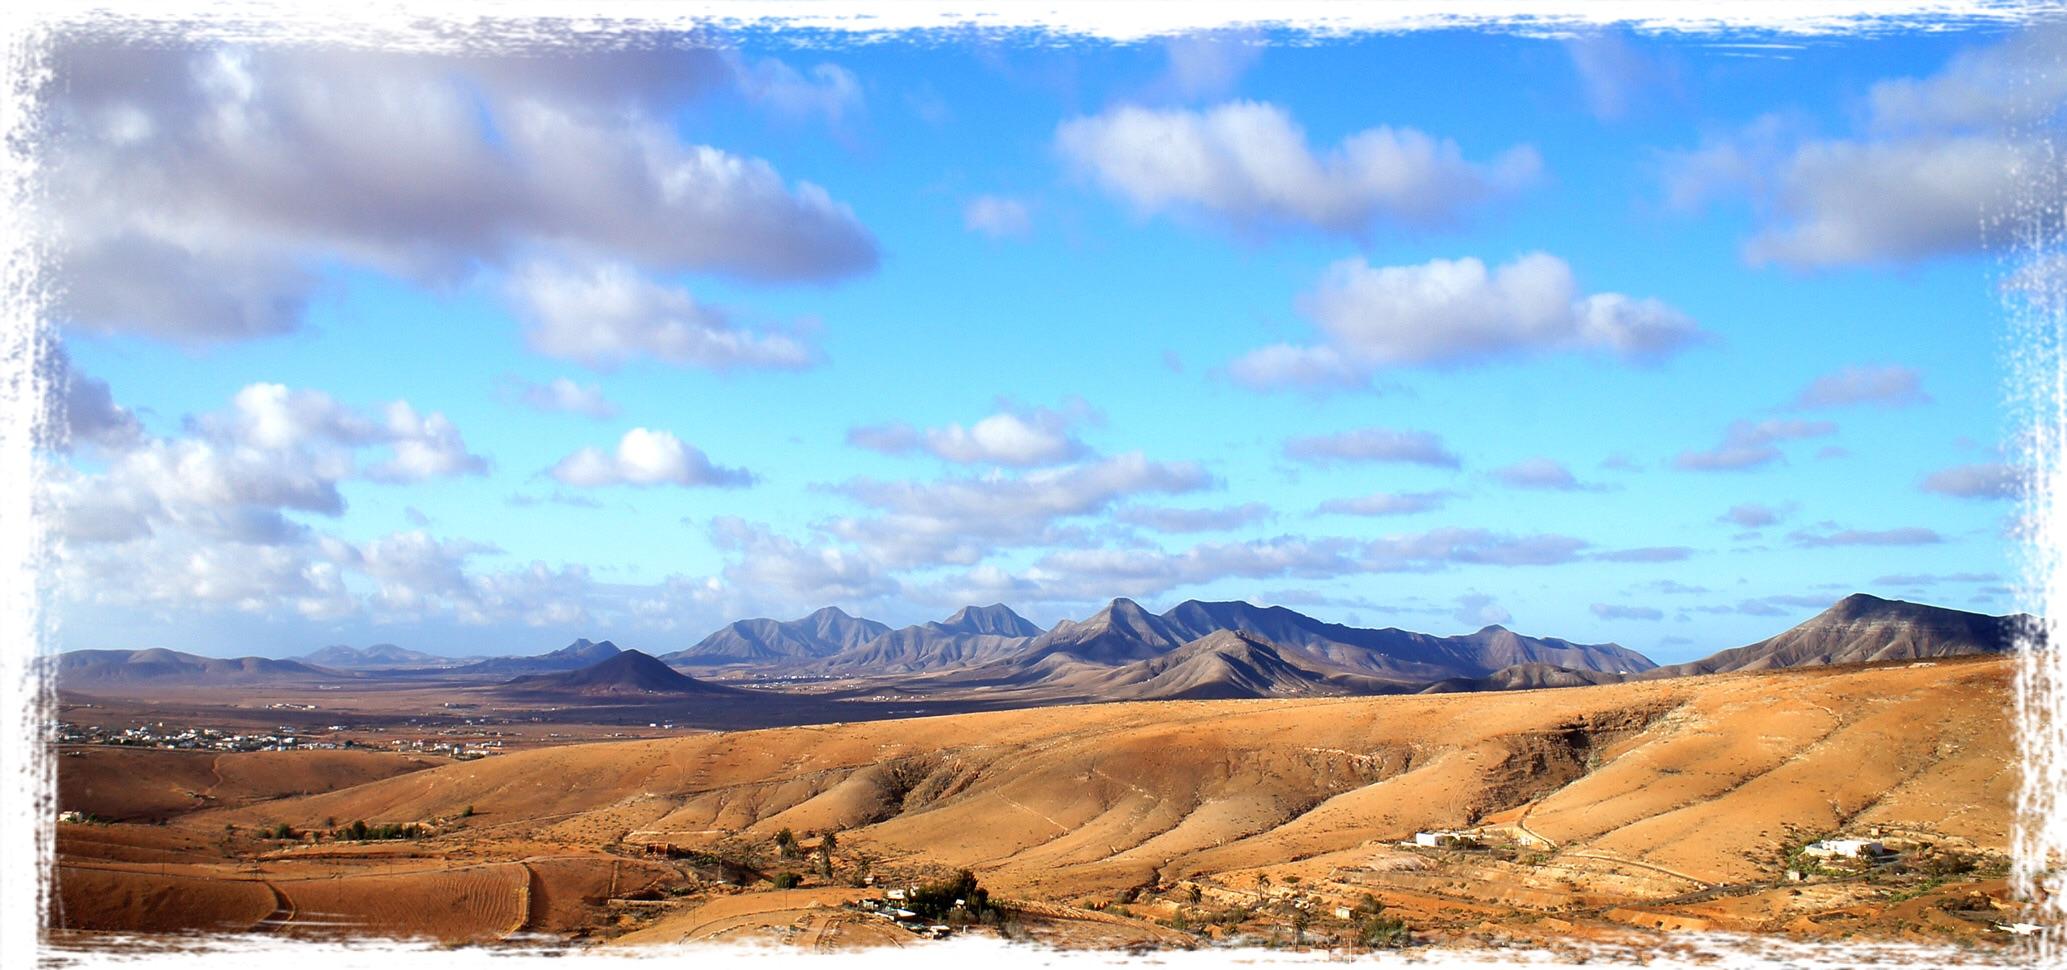 Panoramic_Tour_Fuerteventura,_Valle_de_S._Inés